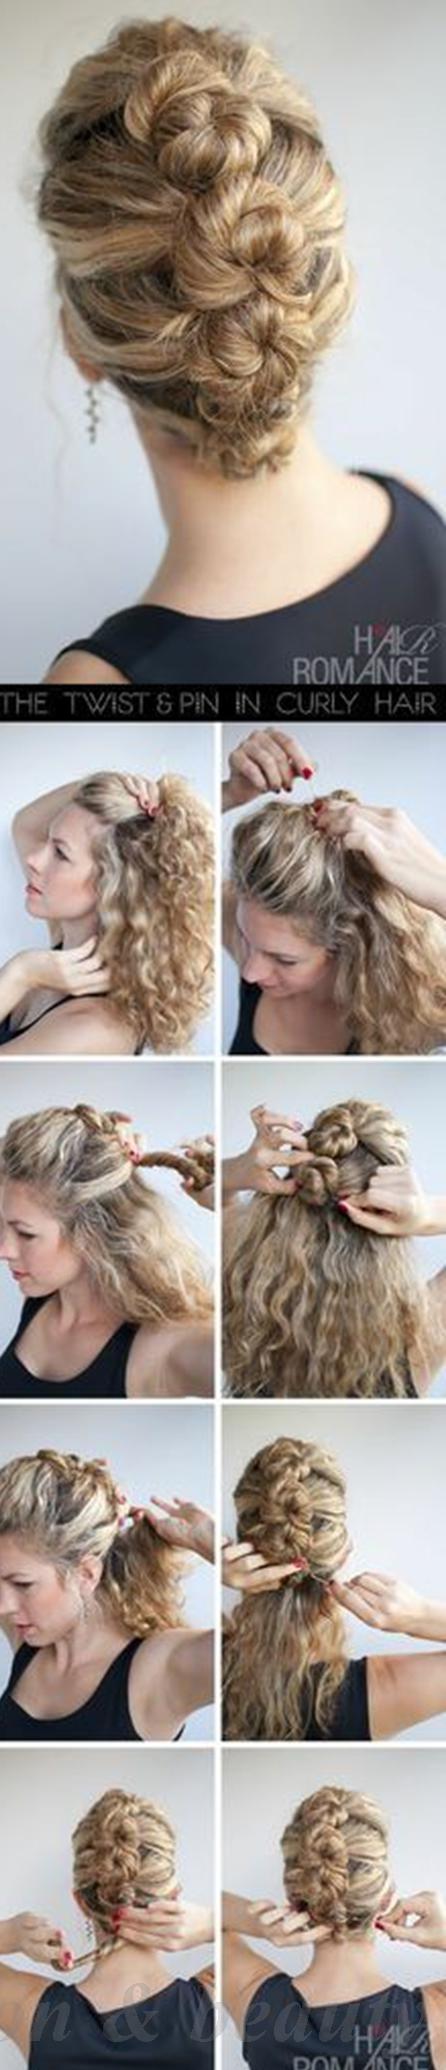 Hair styles for long hair tutorials hair pinterest hair style